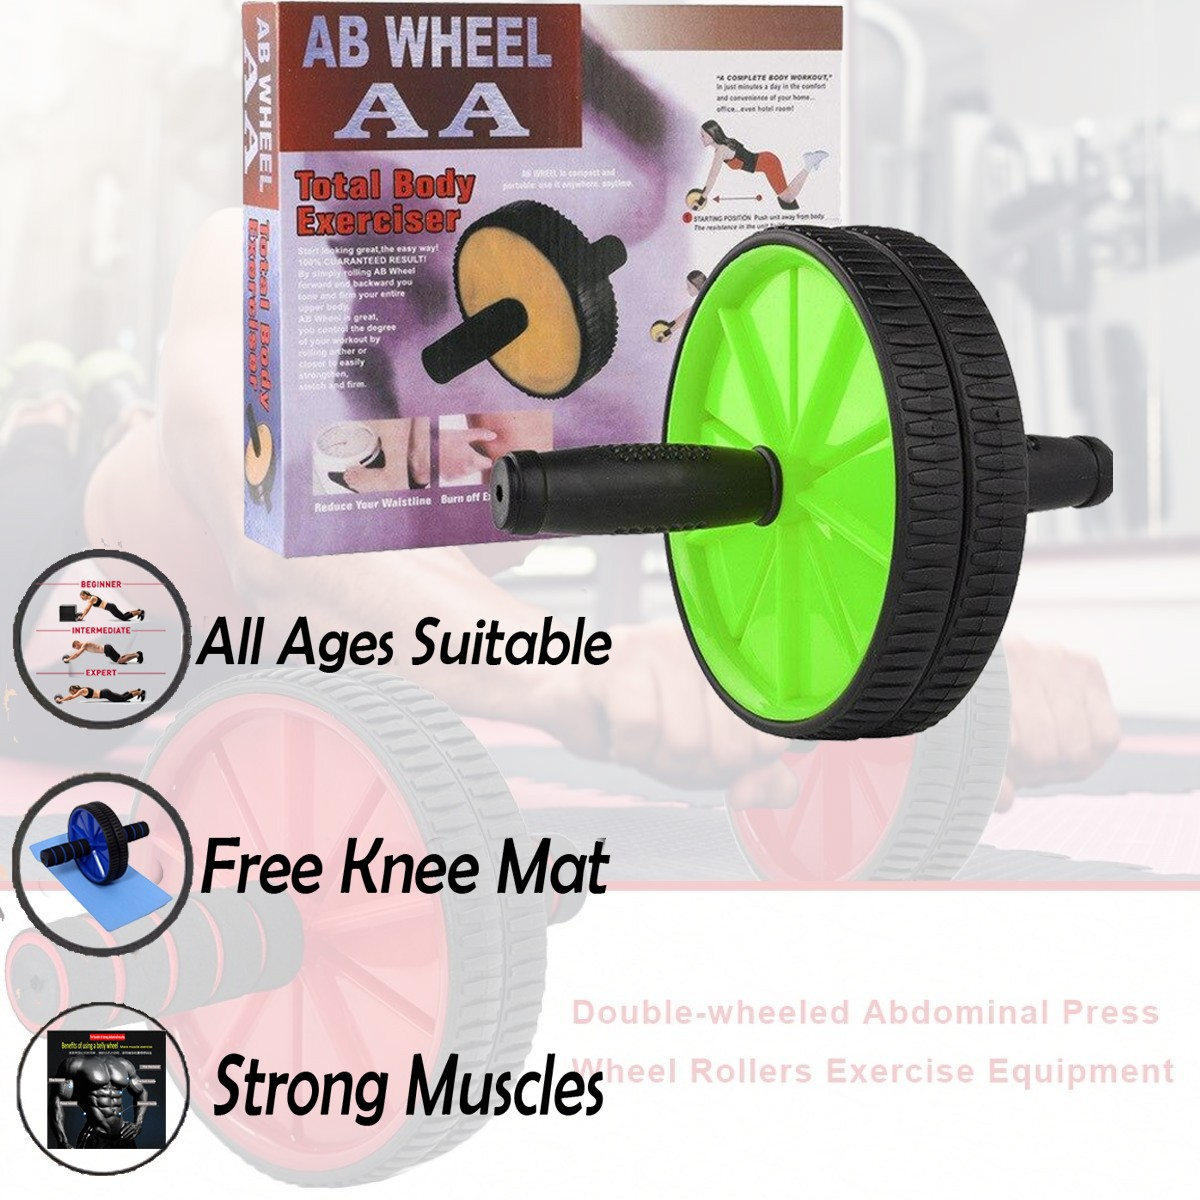 Ab wheel roller abwheel roller abs ab roller wheel with foam abdominal wheel roller